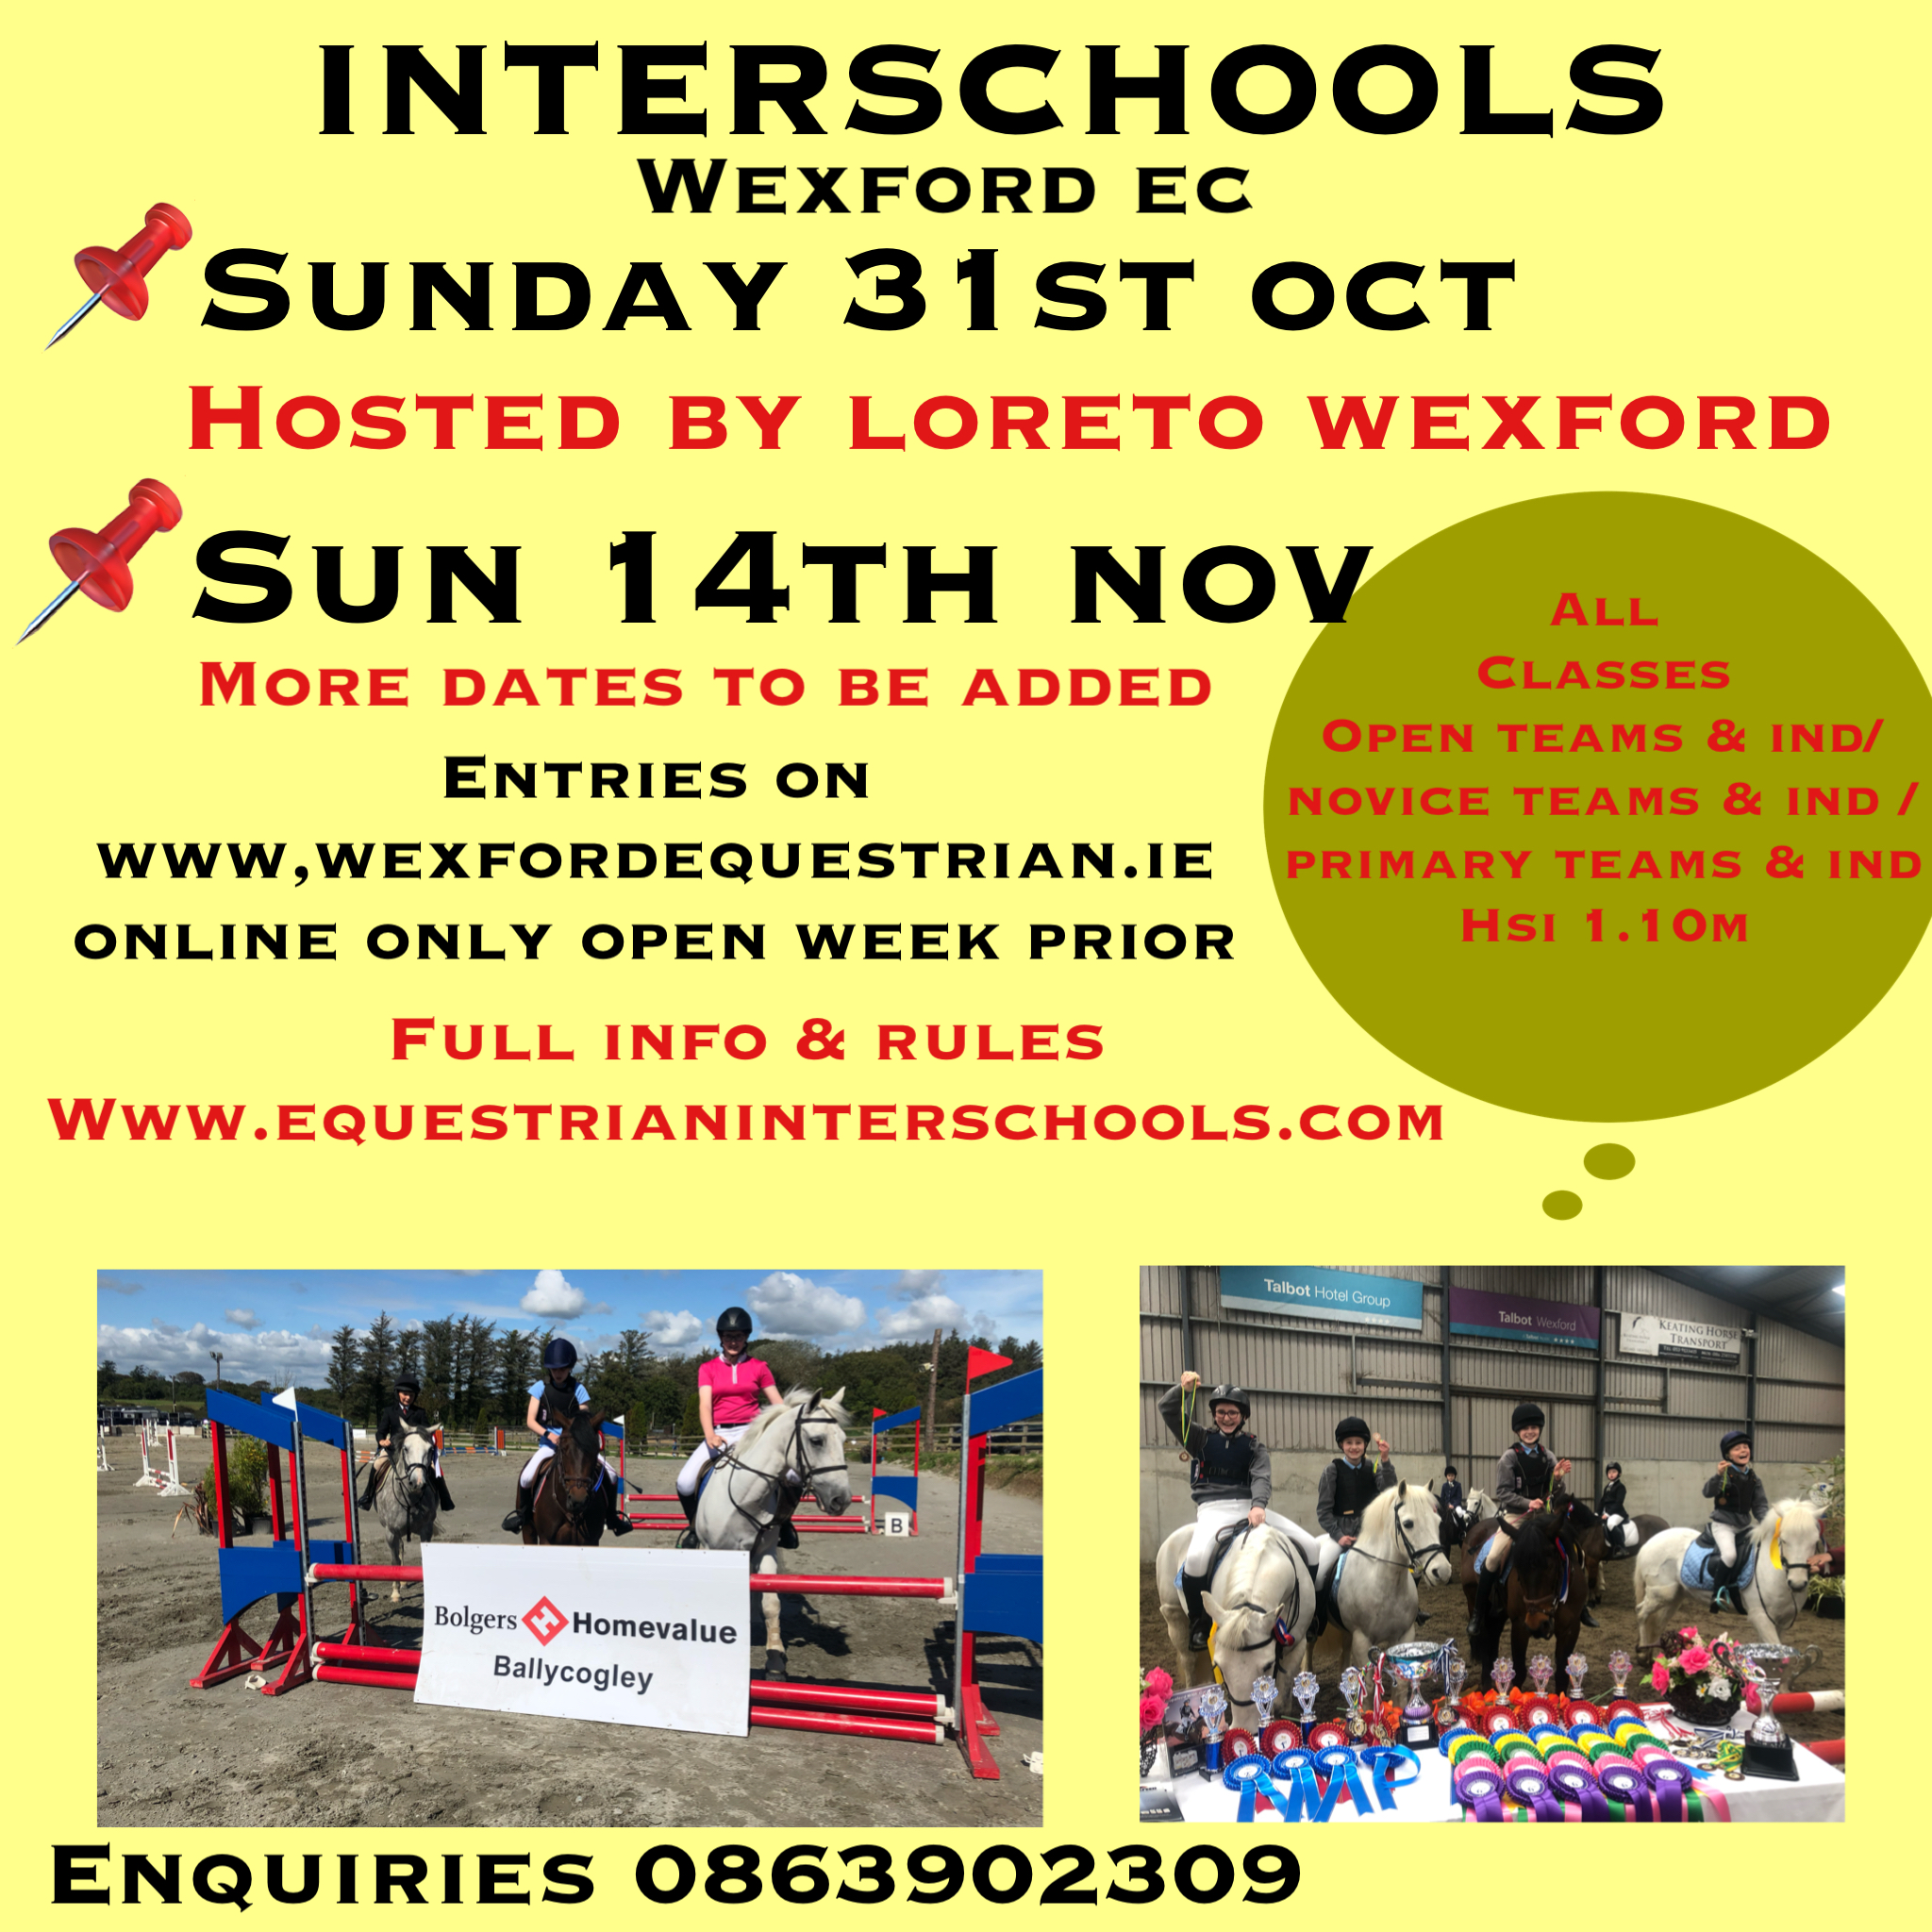 INTERSCHOOLS LEAGUE – WEXFORD EC – HOSTED BY LORETO WEXFORD